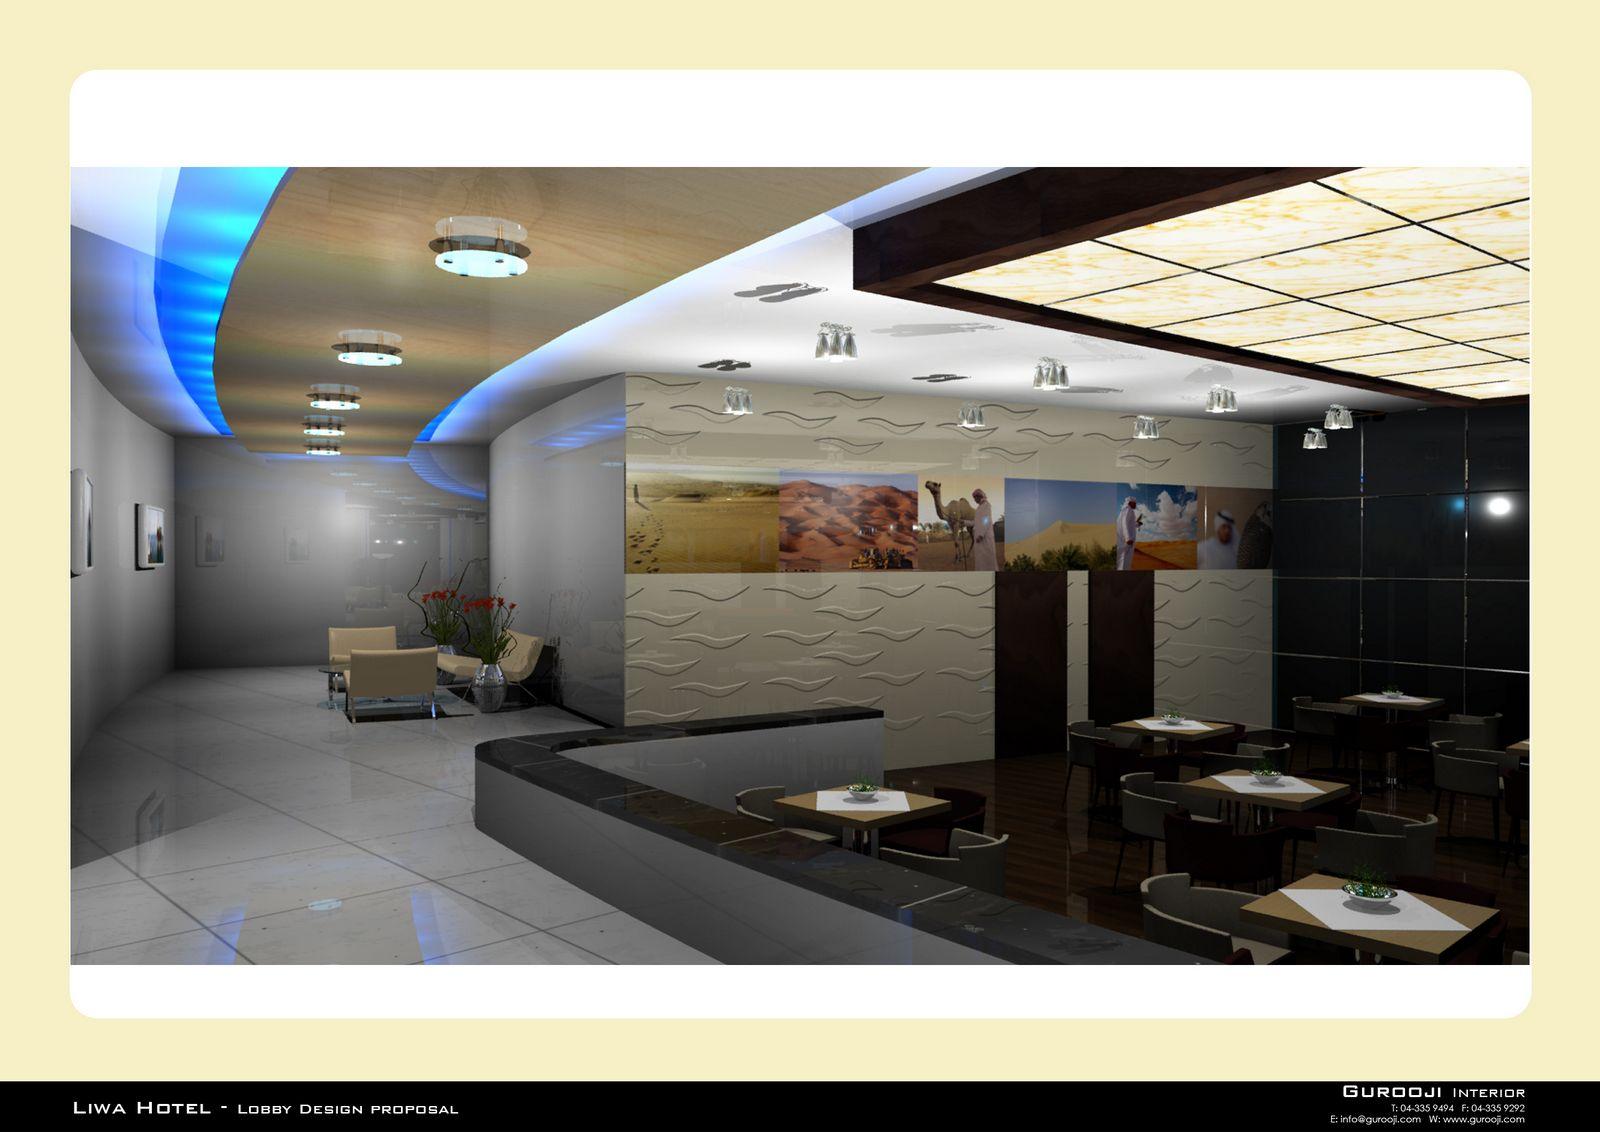 Gurooji design liwa hotel lobby re design for Design hotels tm